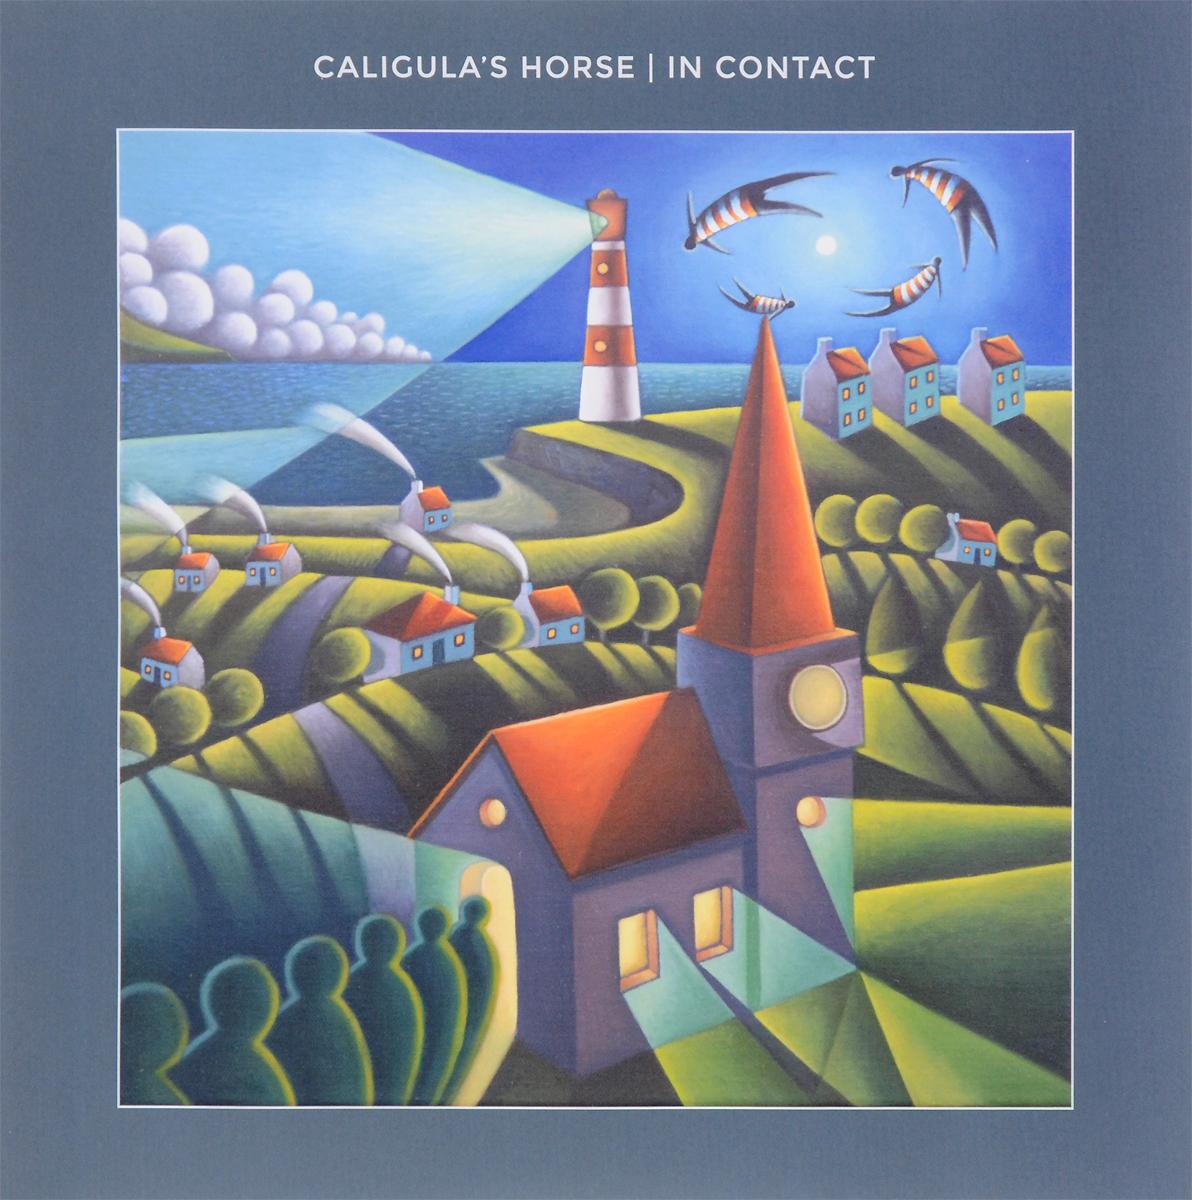 Caligula's Horse Caligula's Horse. In Contact (2 LP) sea horse 1 5 1 8